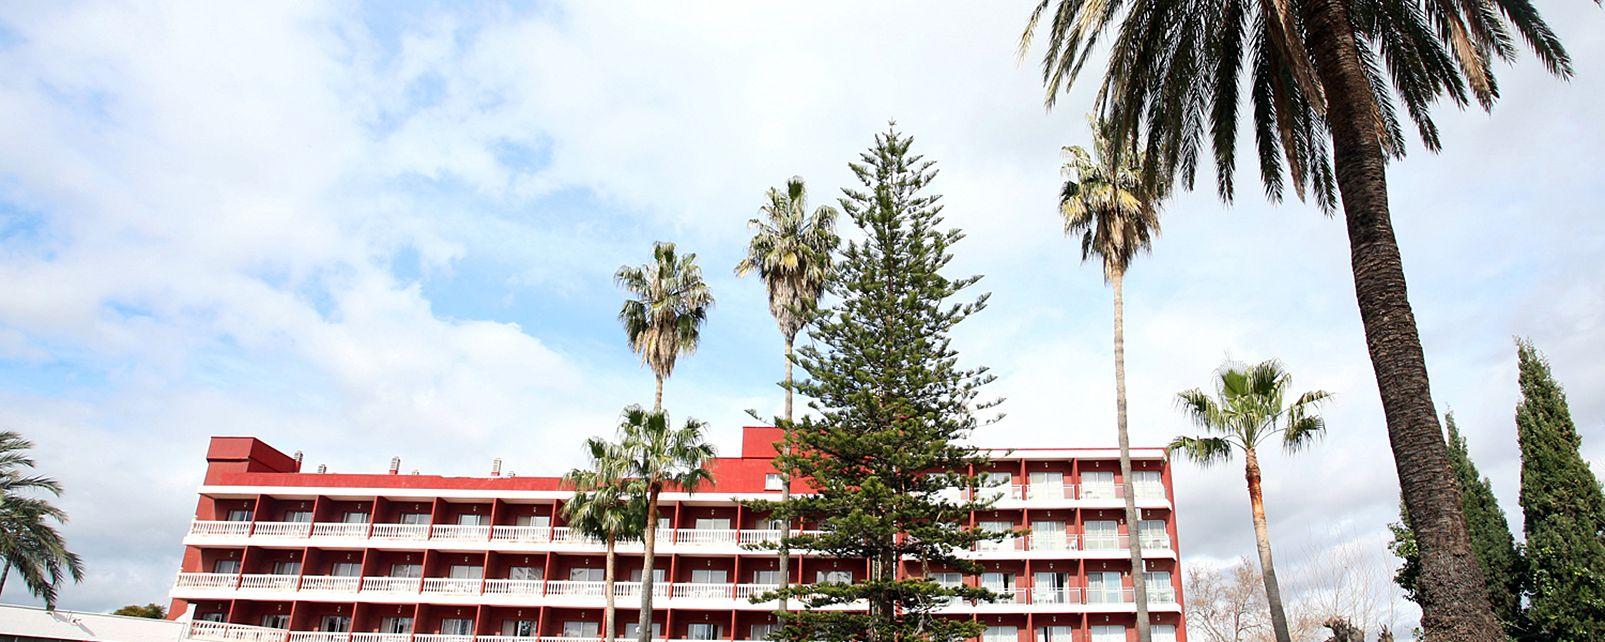 Hôtel Summa Los Álamos